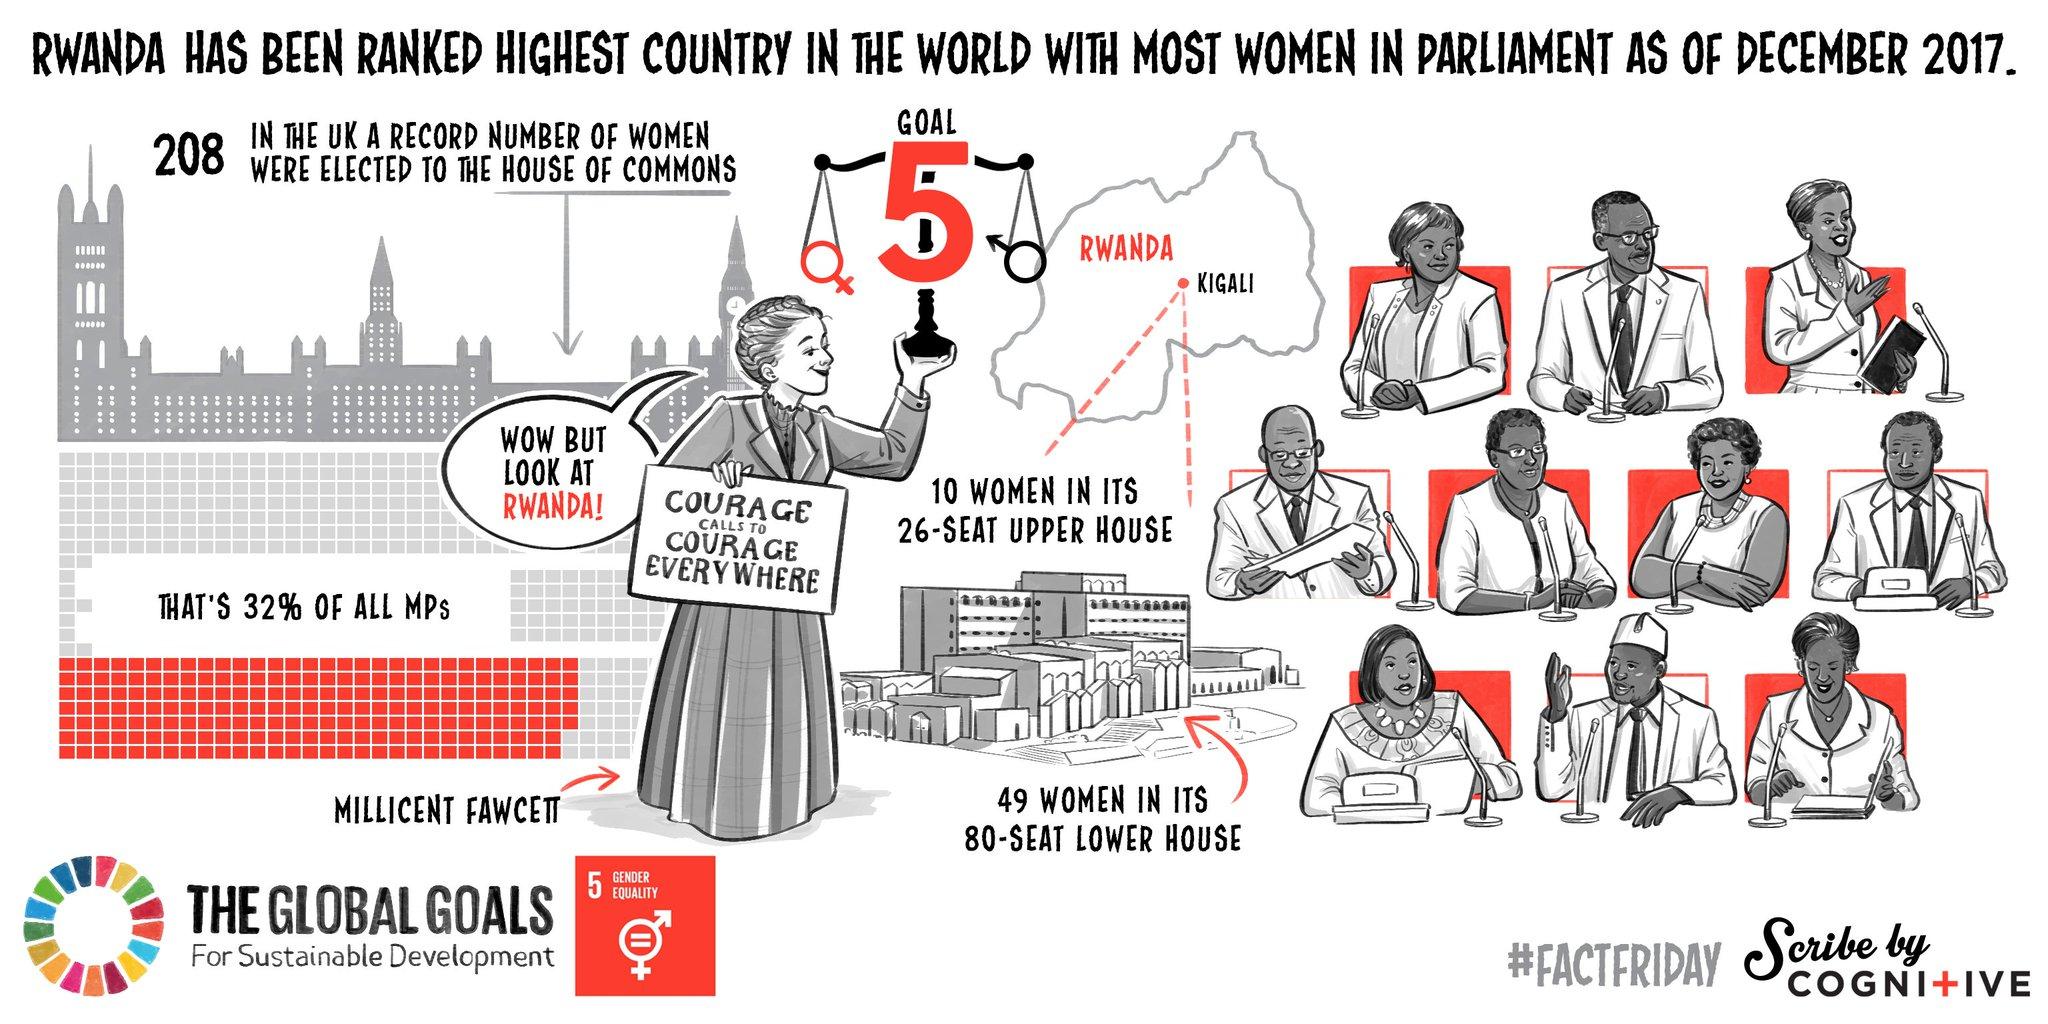 Female MP's Goal 5: Gender Equality